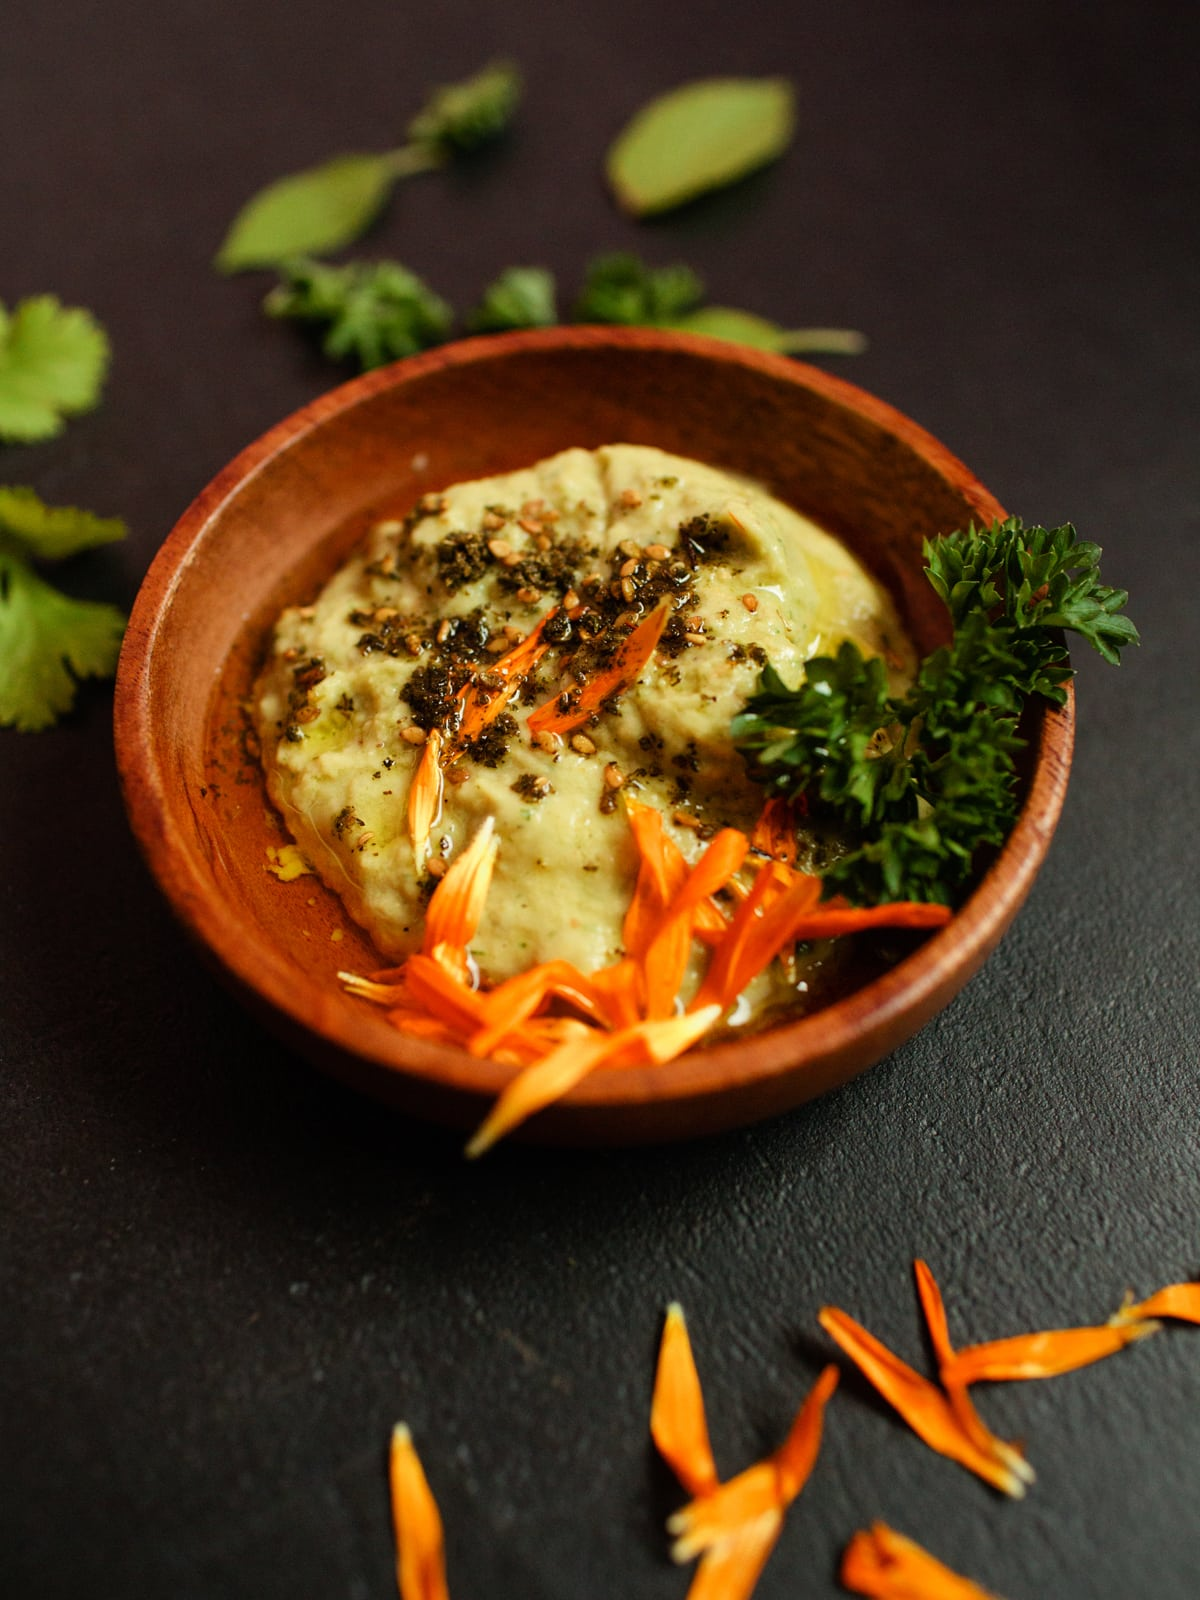 zucchini hummus aus gegrillte zucchini